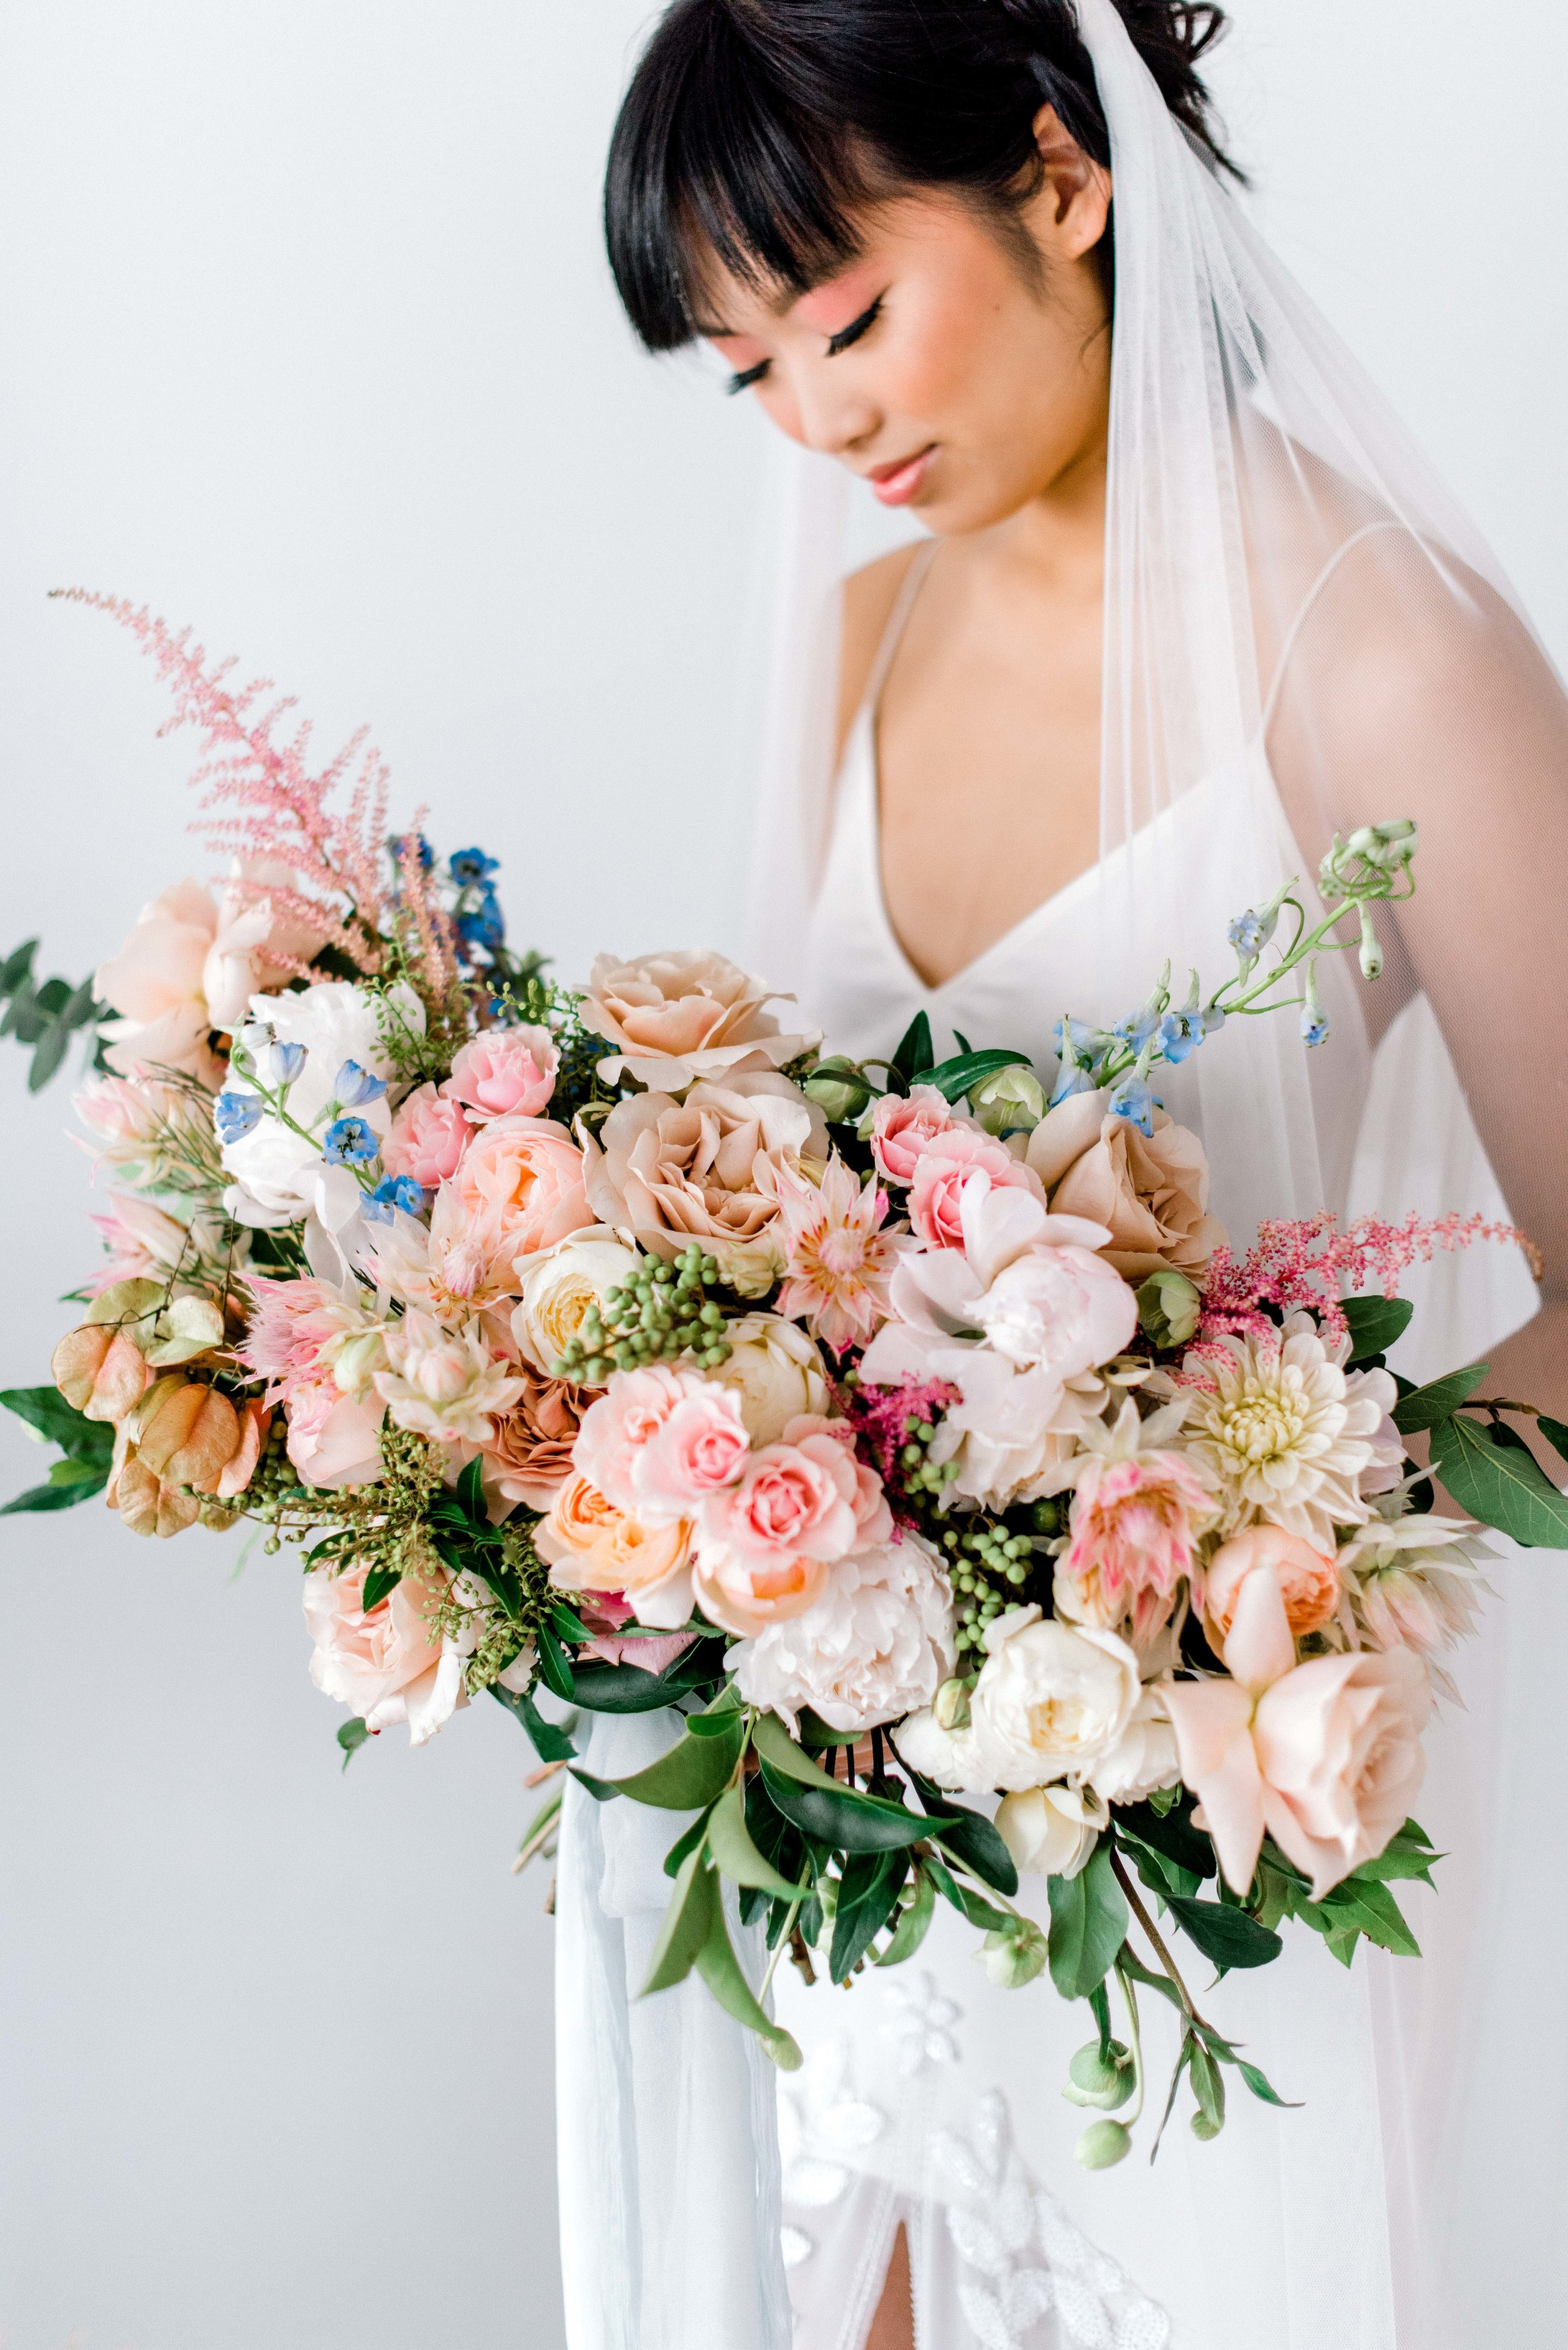 Houston-Wedding-Photographer-Editorial-Fine-Art-Film-Destination-Dallas-Texas-Mibellarosa-Josh-Dana-Fernandez-Photography-5.jpg